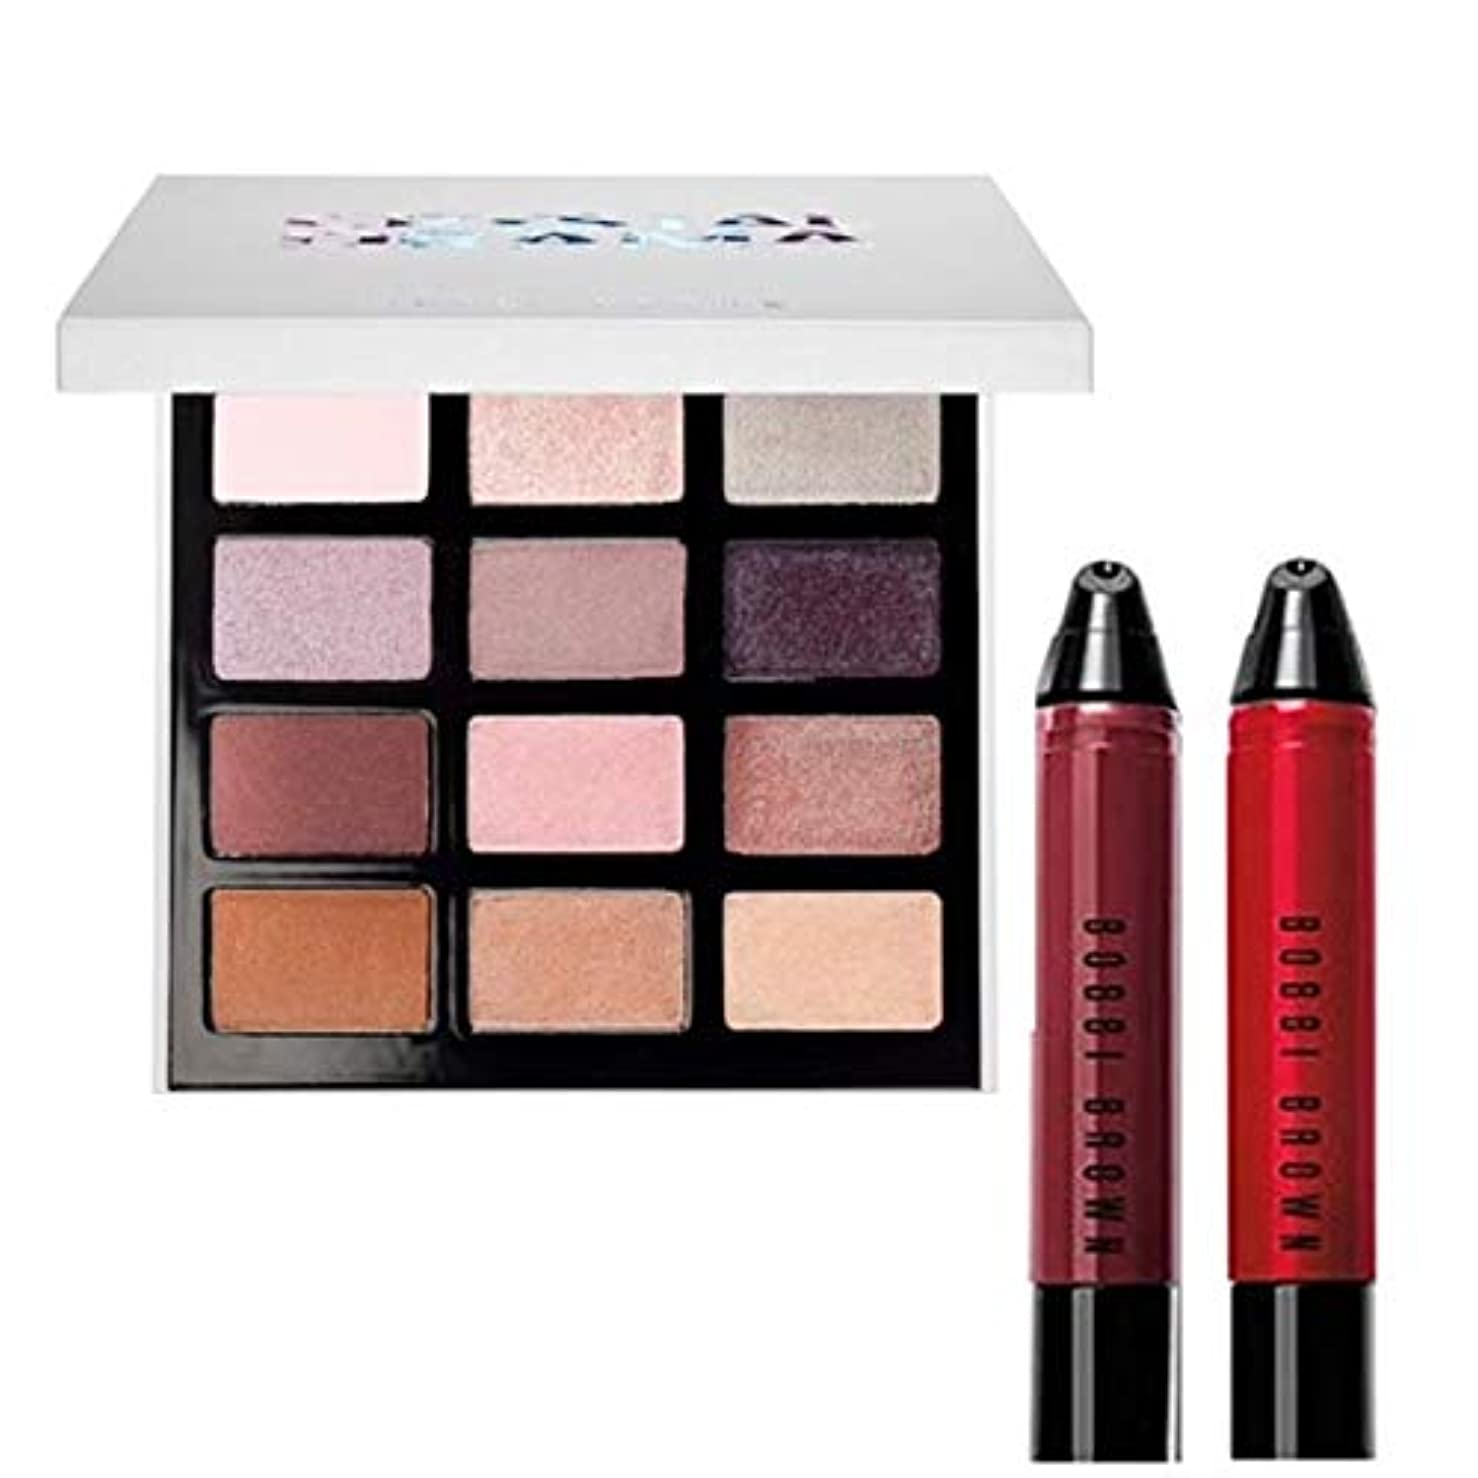 不振容疑者誰のBobbi Brown 限定版,Crystal Drama Eyeshadow Palette & Lip Art Mini Art Stick Liquid Lip 2Set [海外直送品] [並行輸入品]